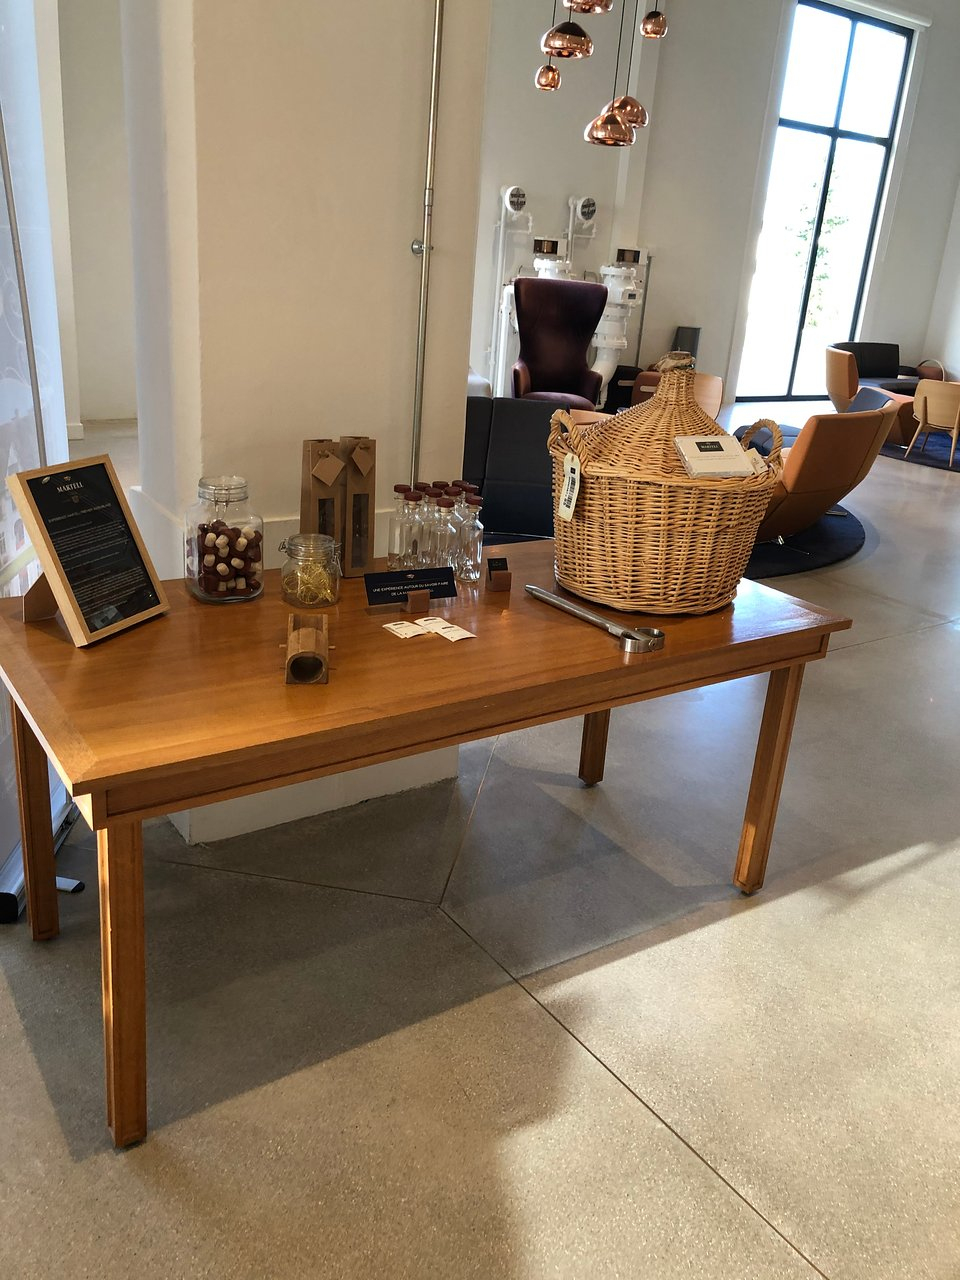 Salon De Jardin Blanc Design Charmant Martell Cognac S ... avec Salon De Jardin Blanc Design